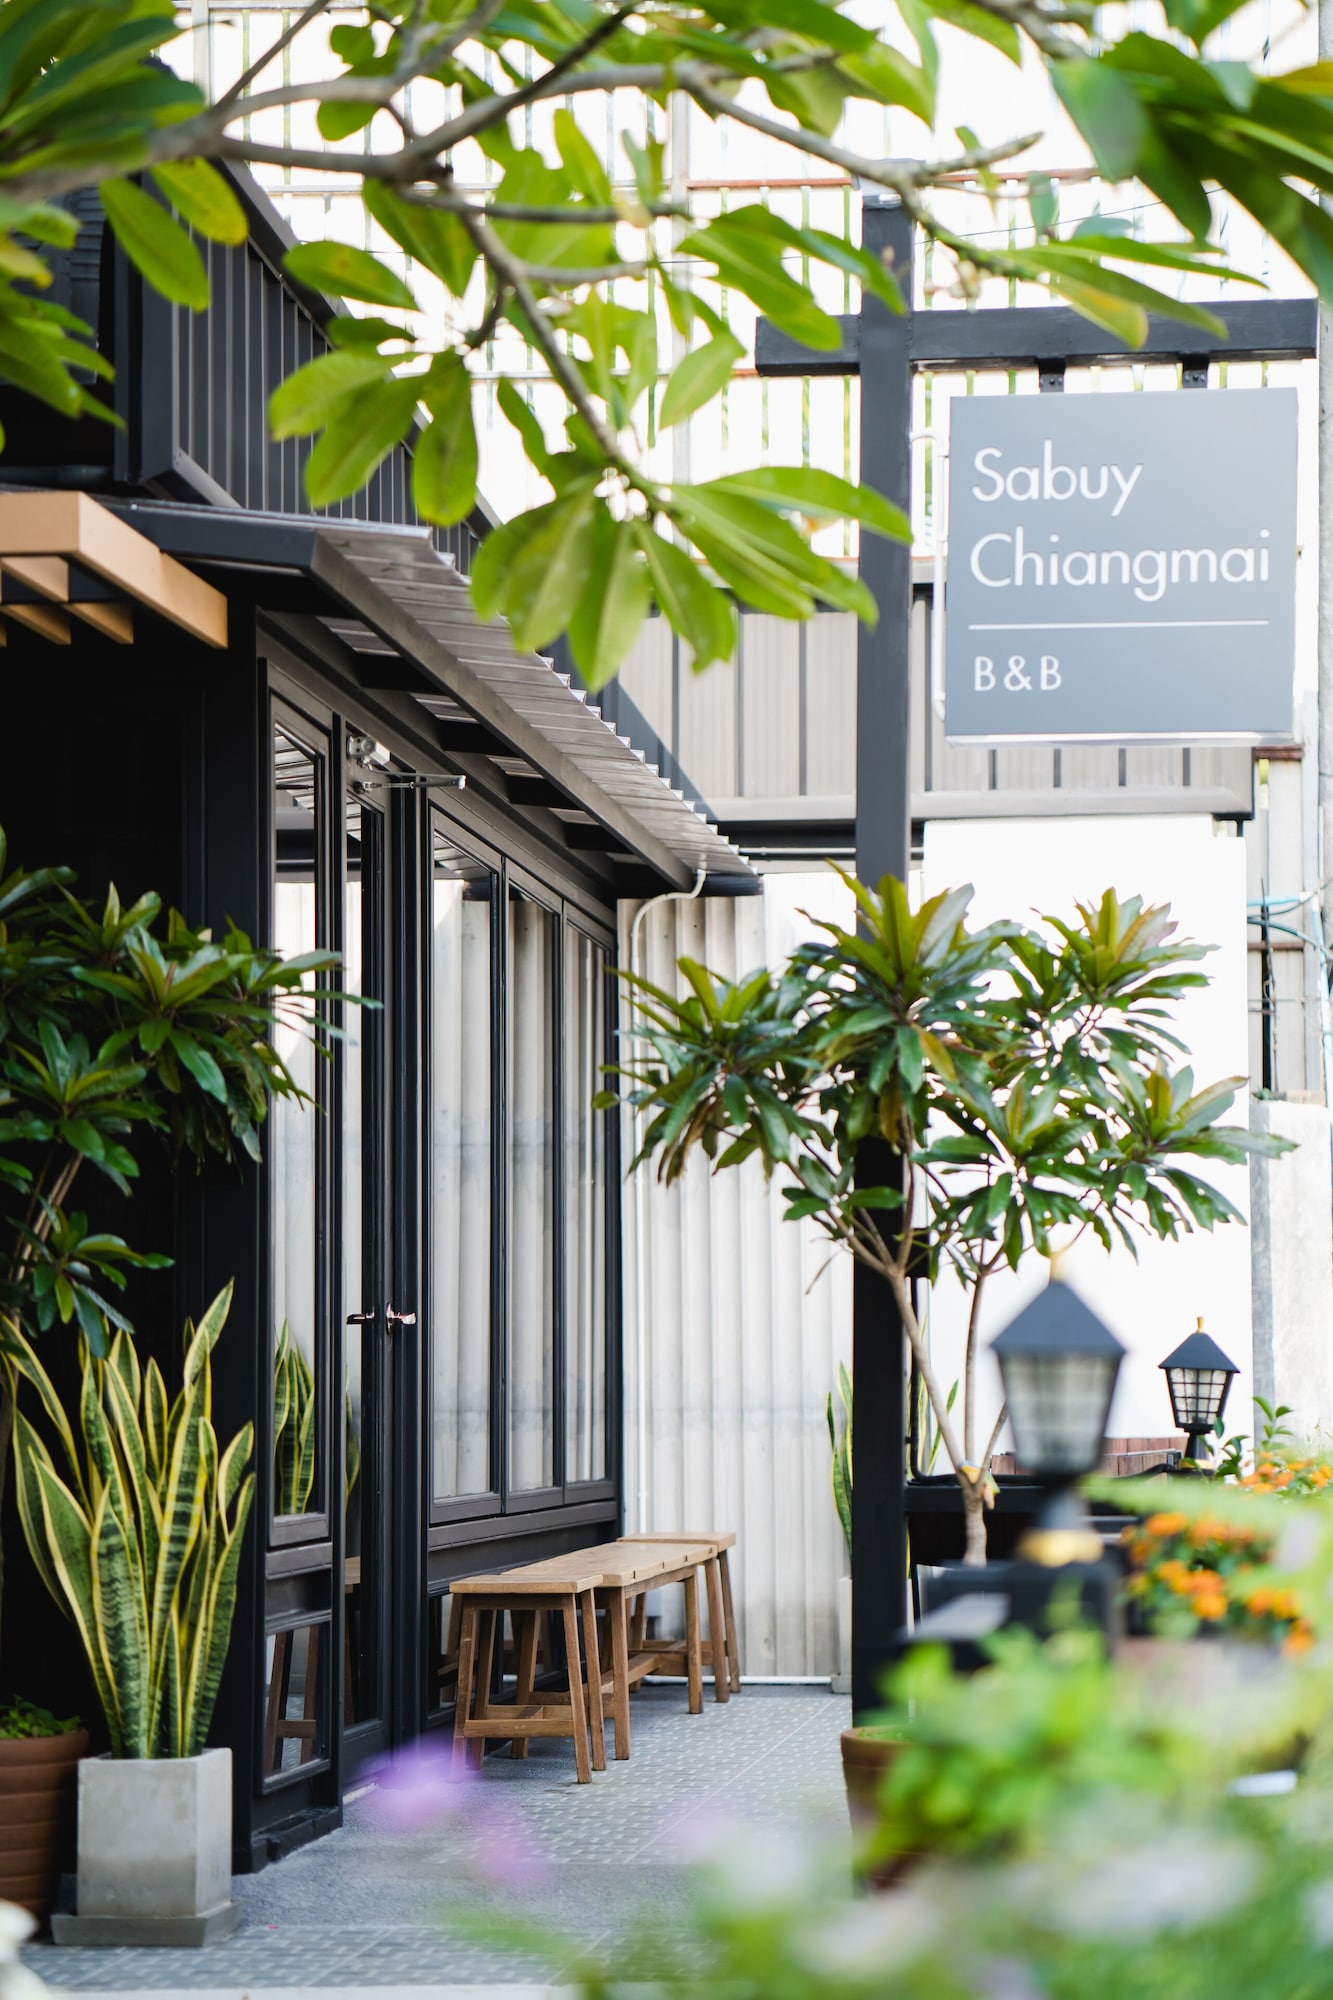 Sabuy Chiangmai Bed & Breakfast, Muang Chiang Mai